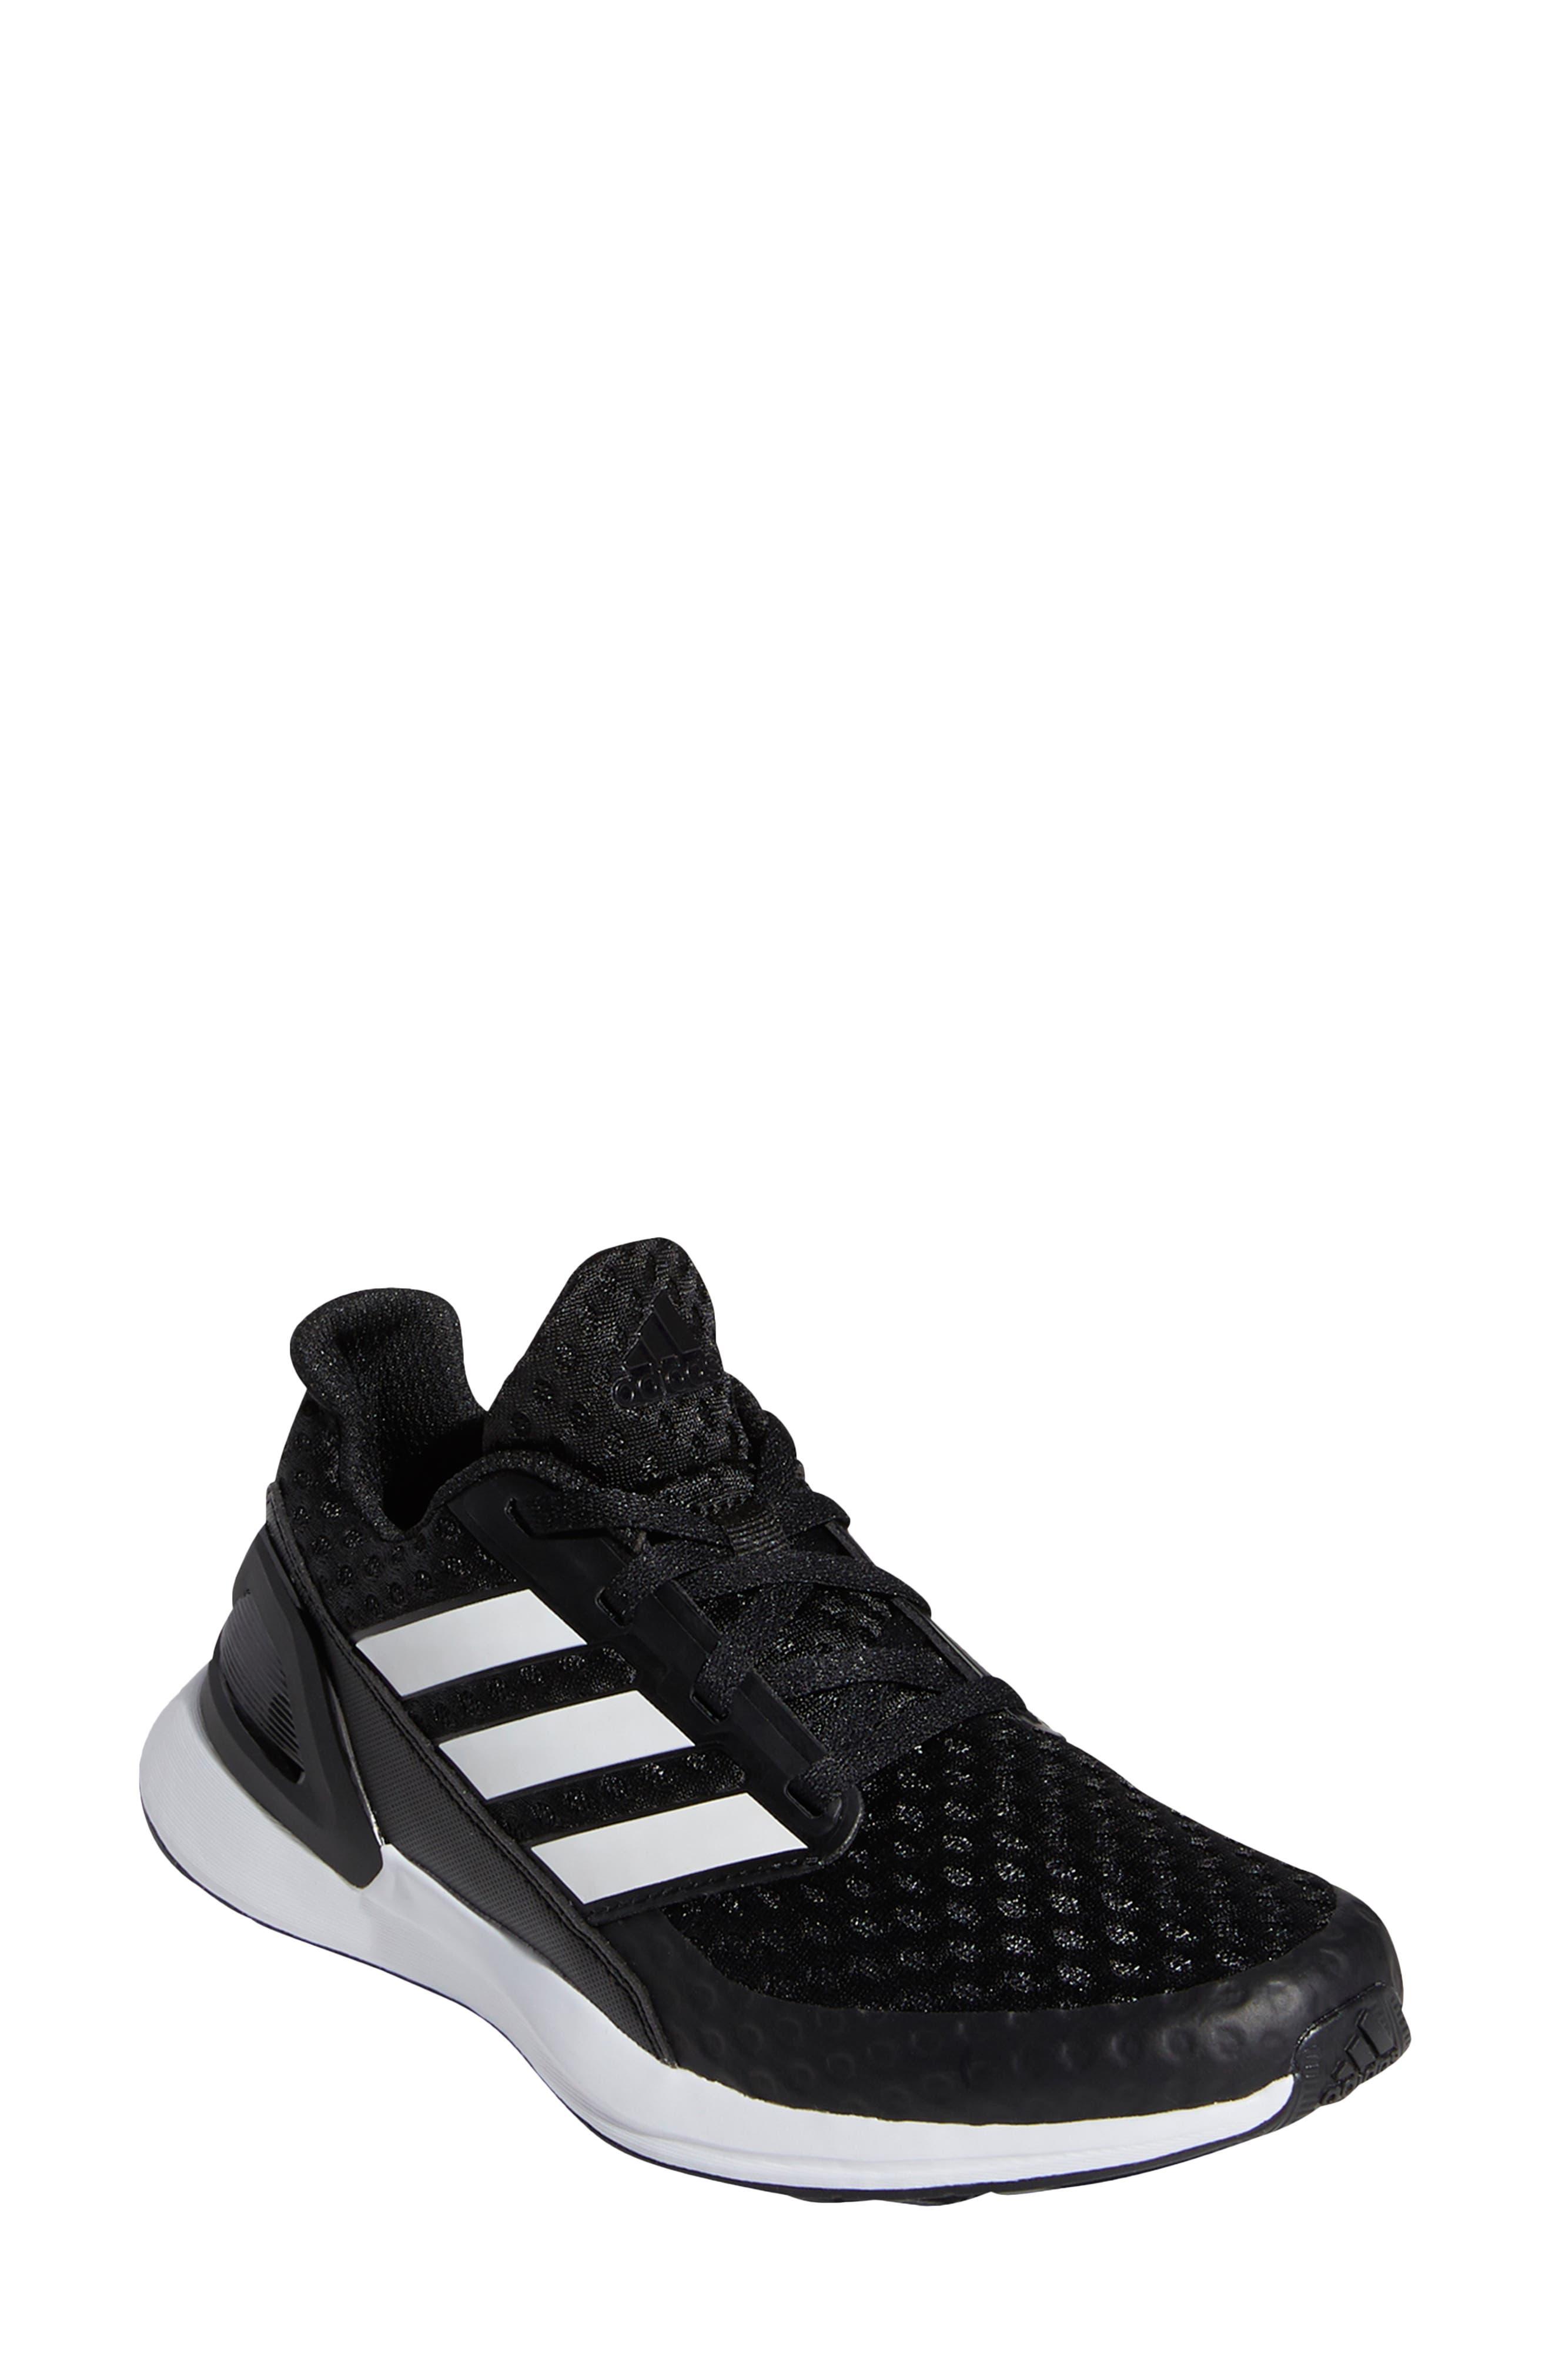 Adidas RapidaRun Sneaker (Big Kid) | Nordstrom